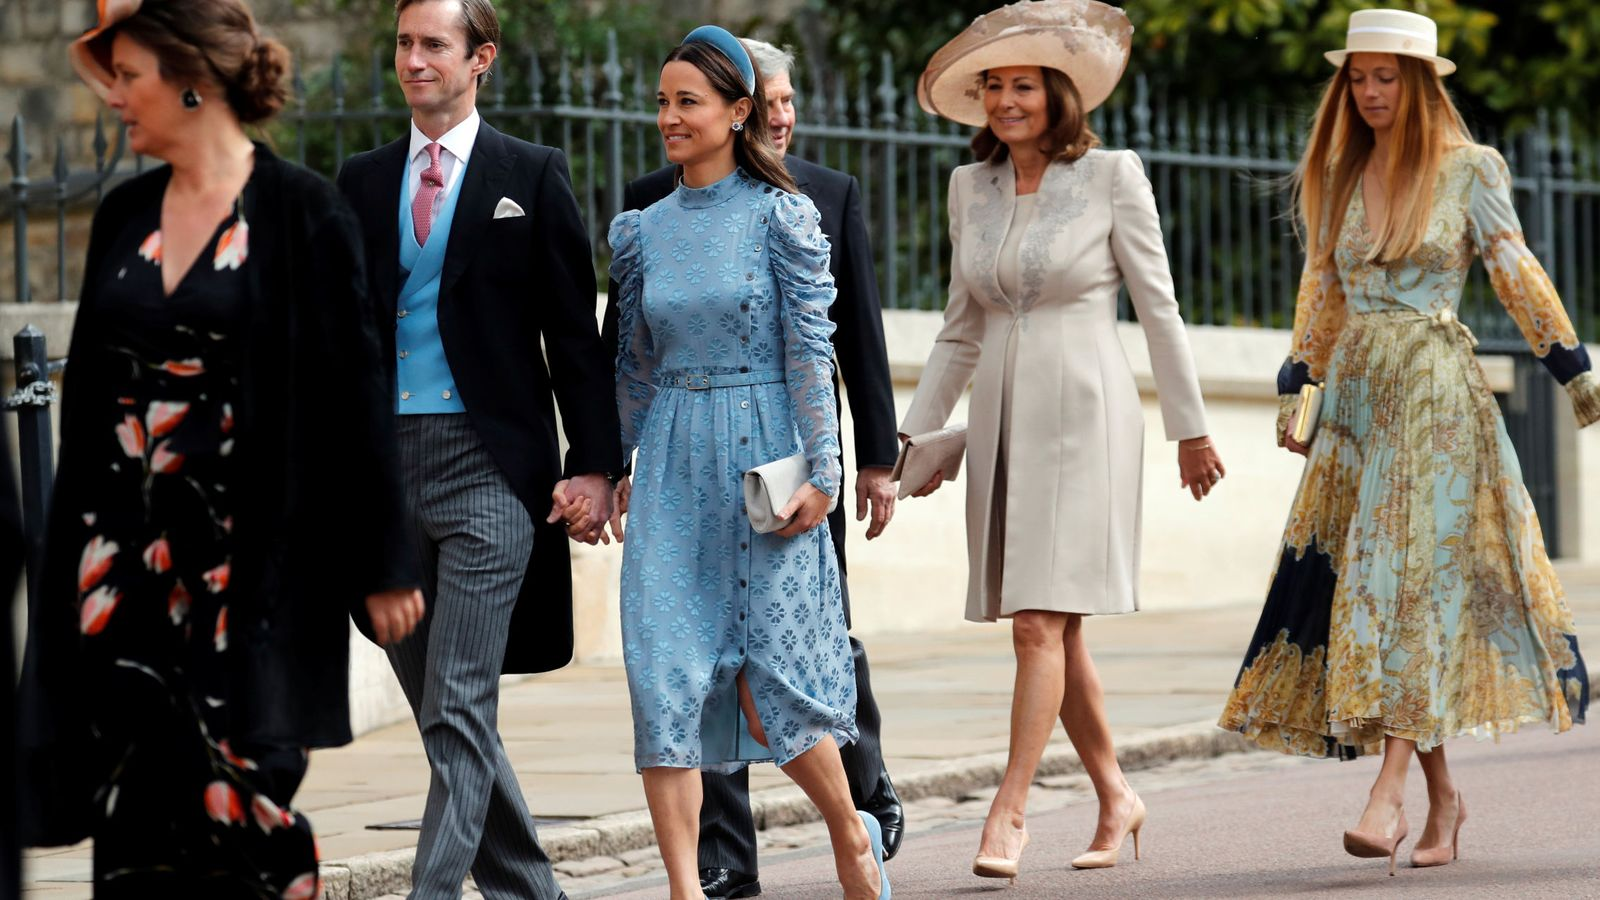 Foto: Alizee Thevenet junto a la familia Middleton, en la boda de Lady Gabriella. (Reuters)